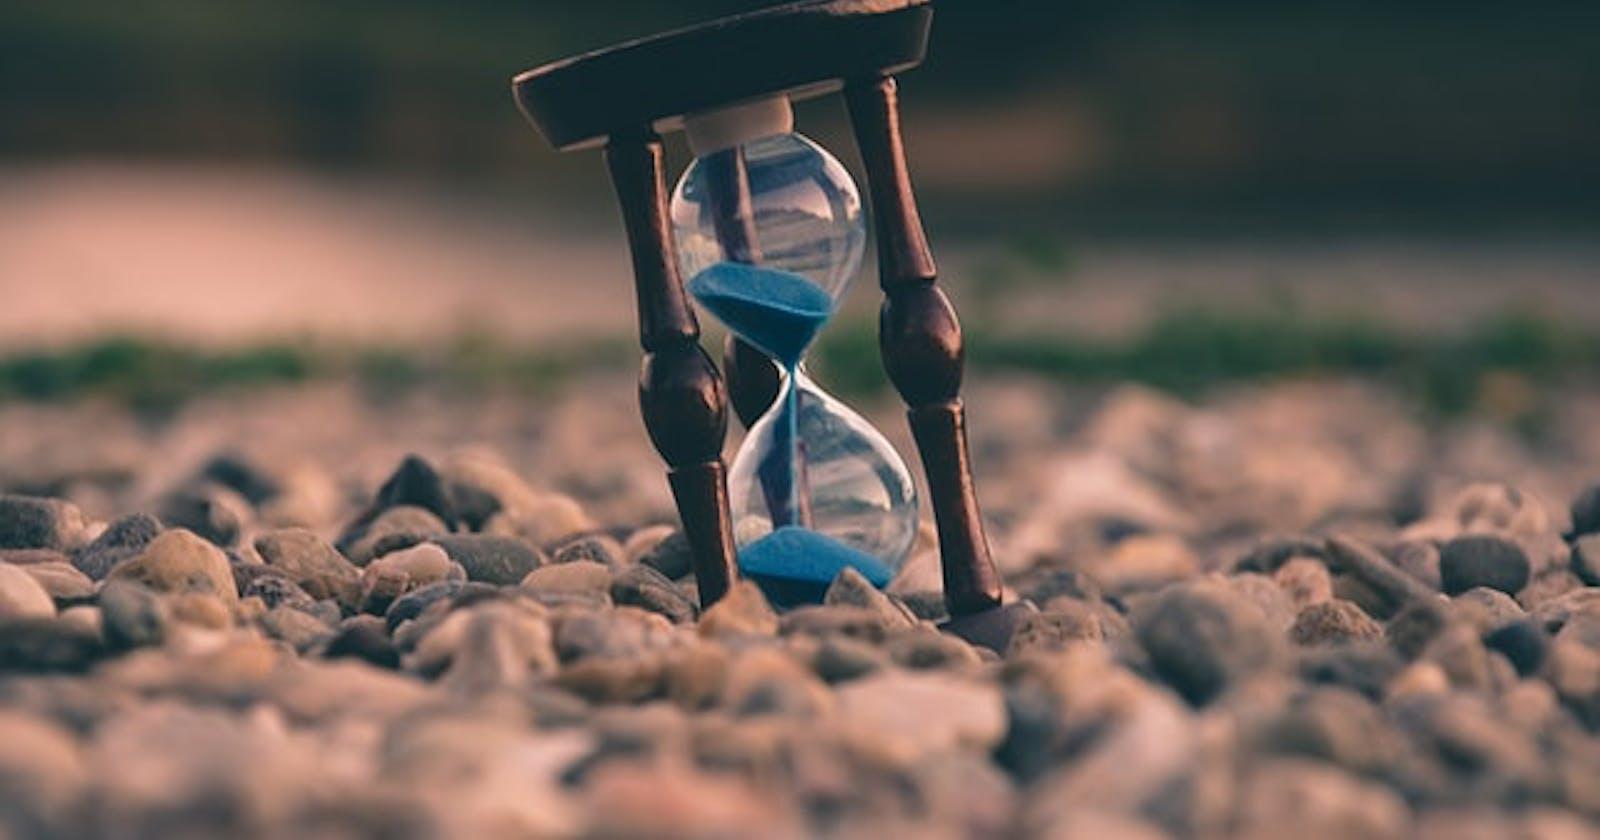 When to use setTimeout vs setInterval?